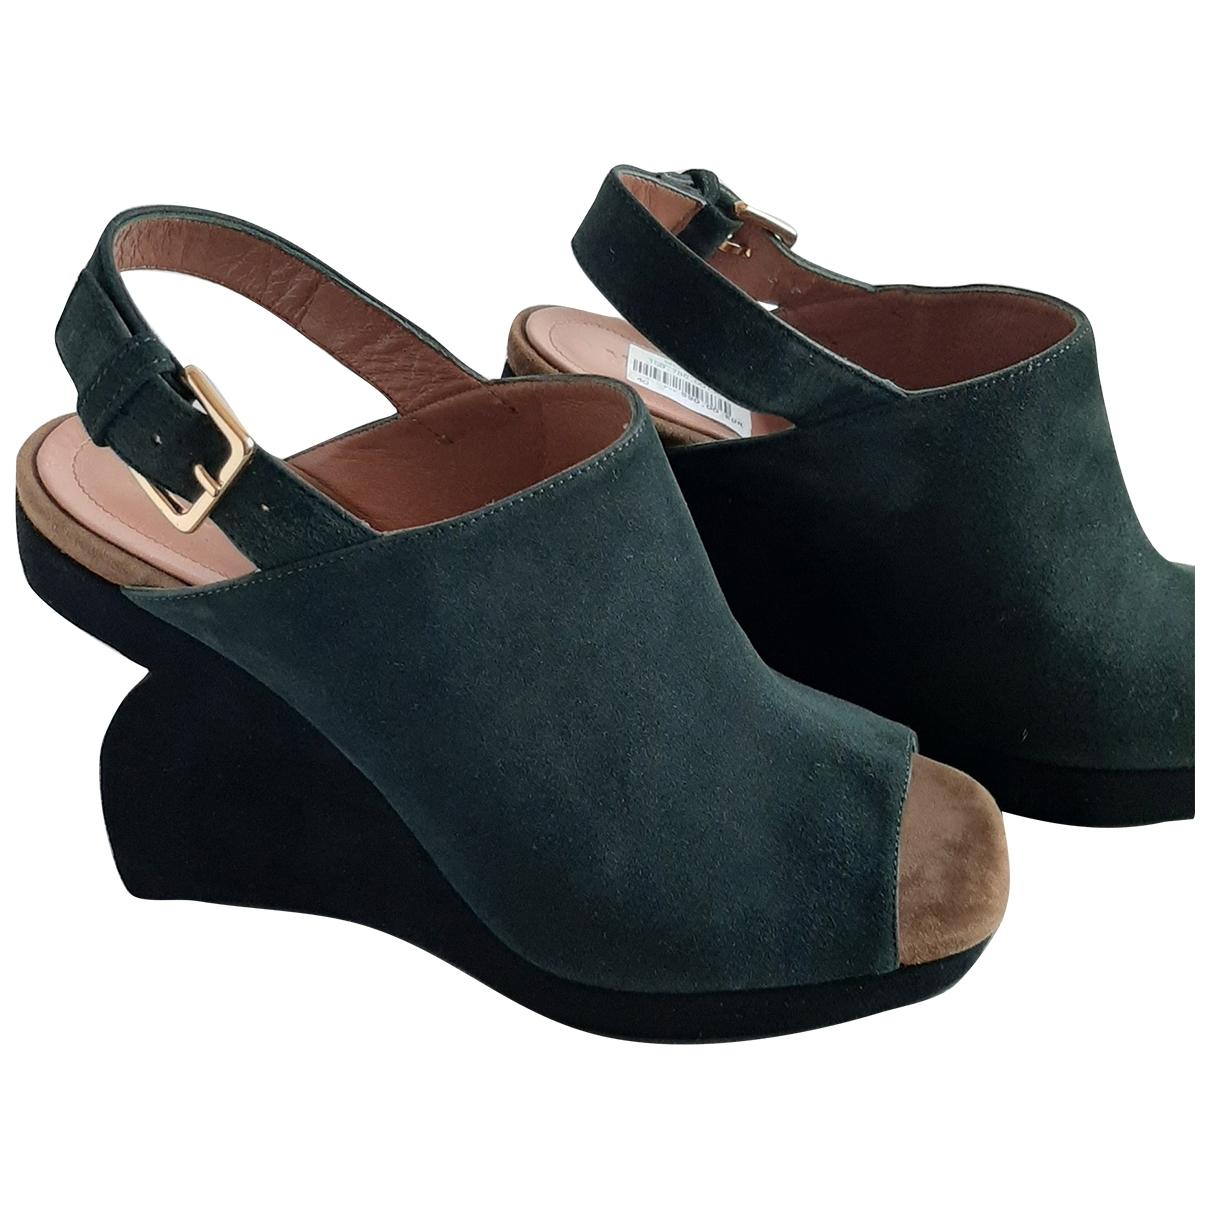 Marni \N Green Suede Sandals for Women 40 EU